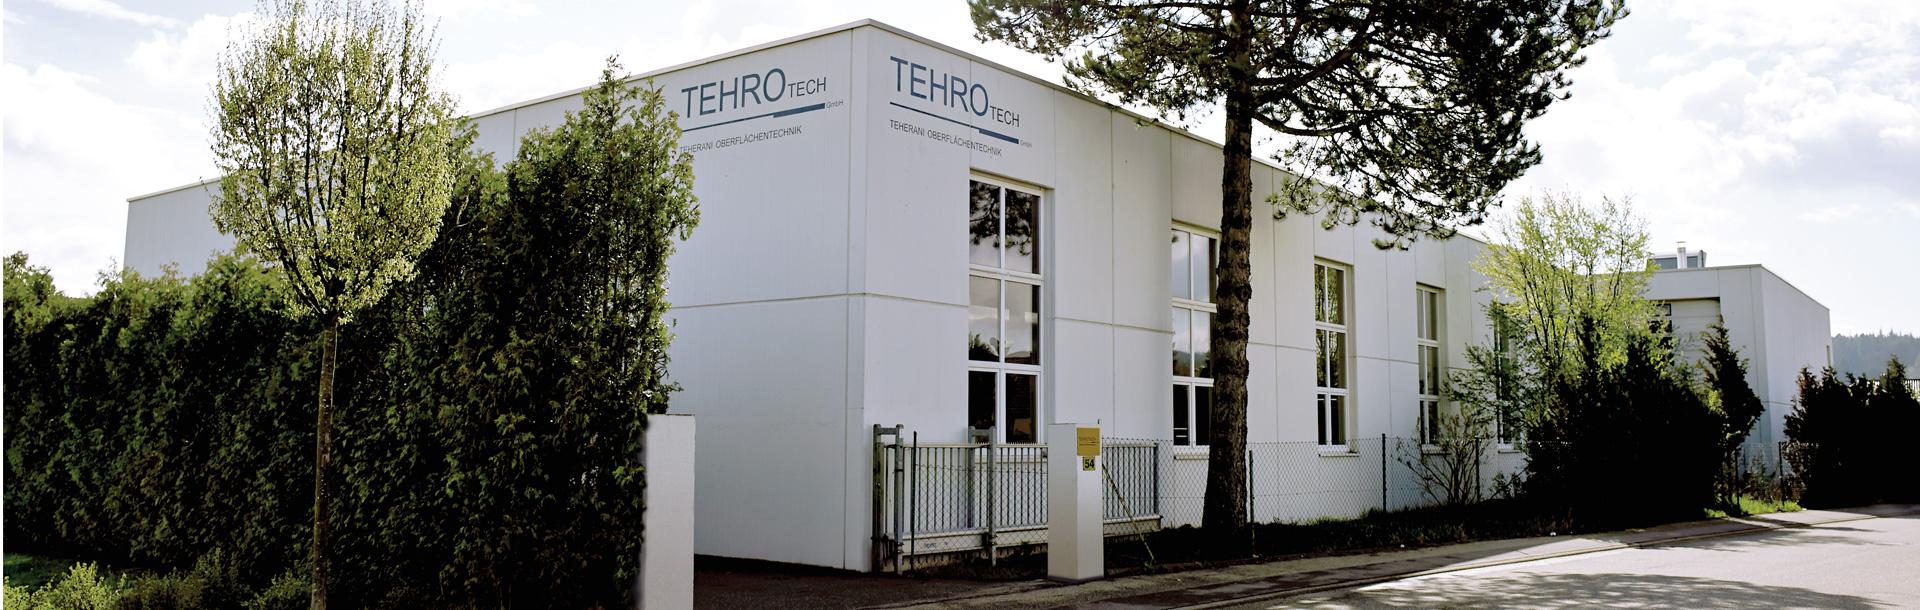 Tehrotech GmbH Firmenprofil